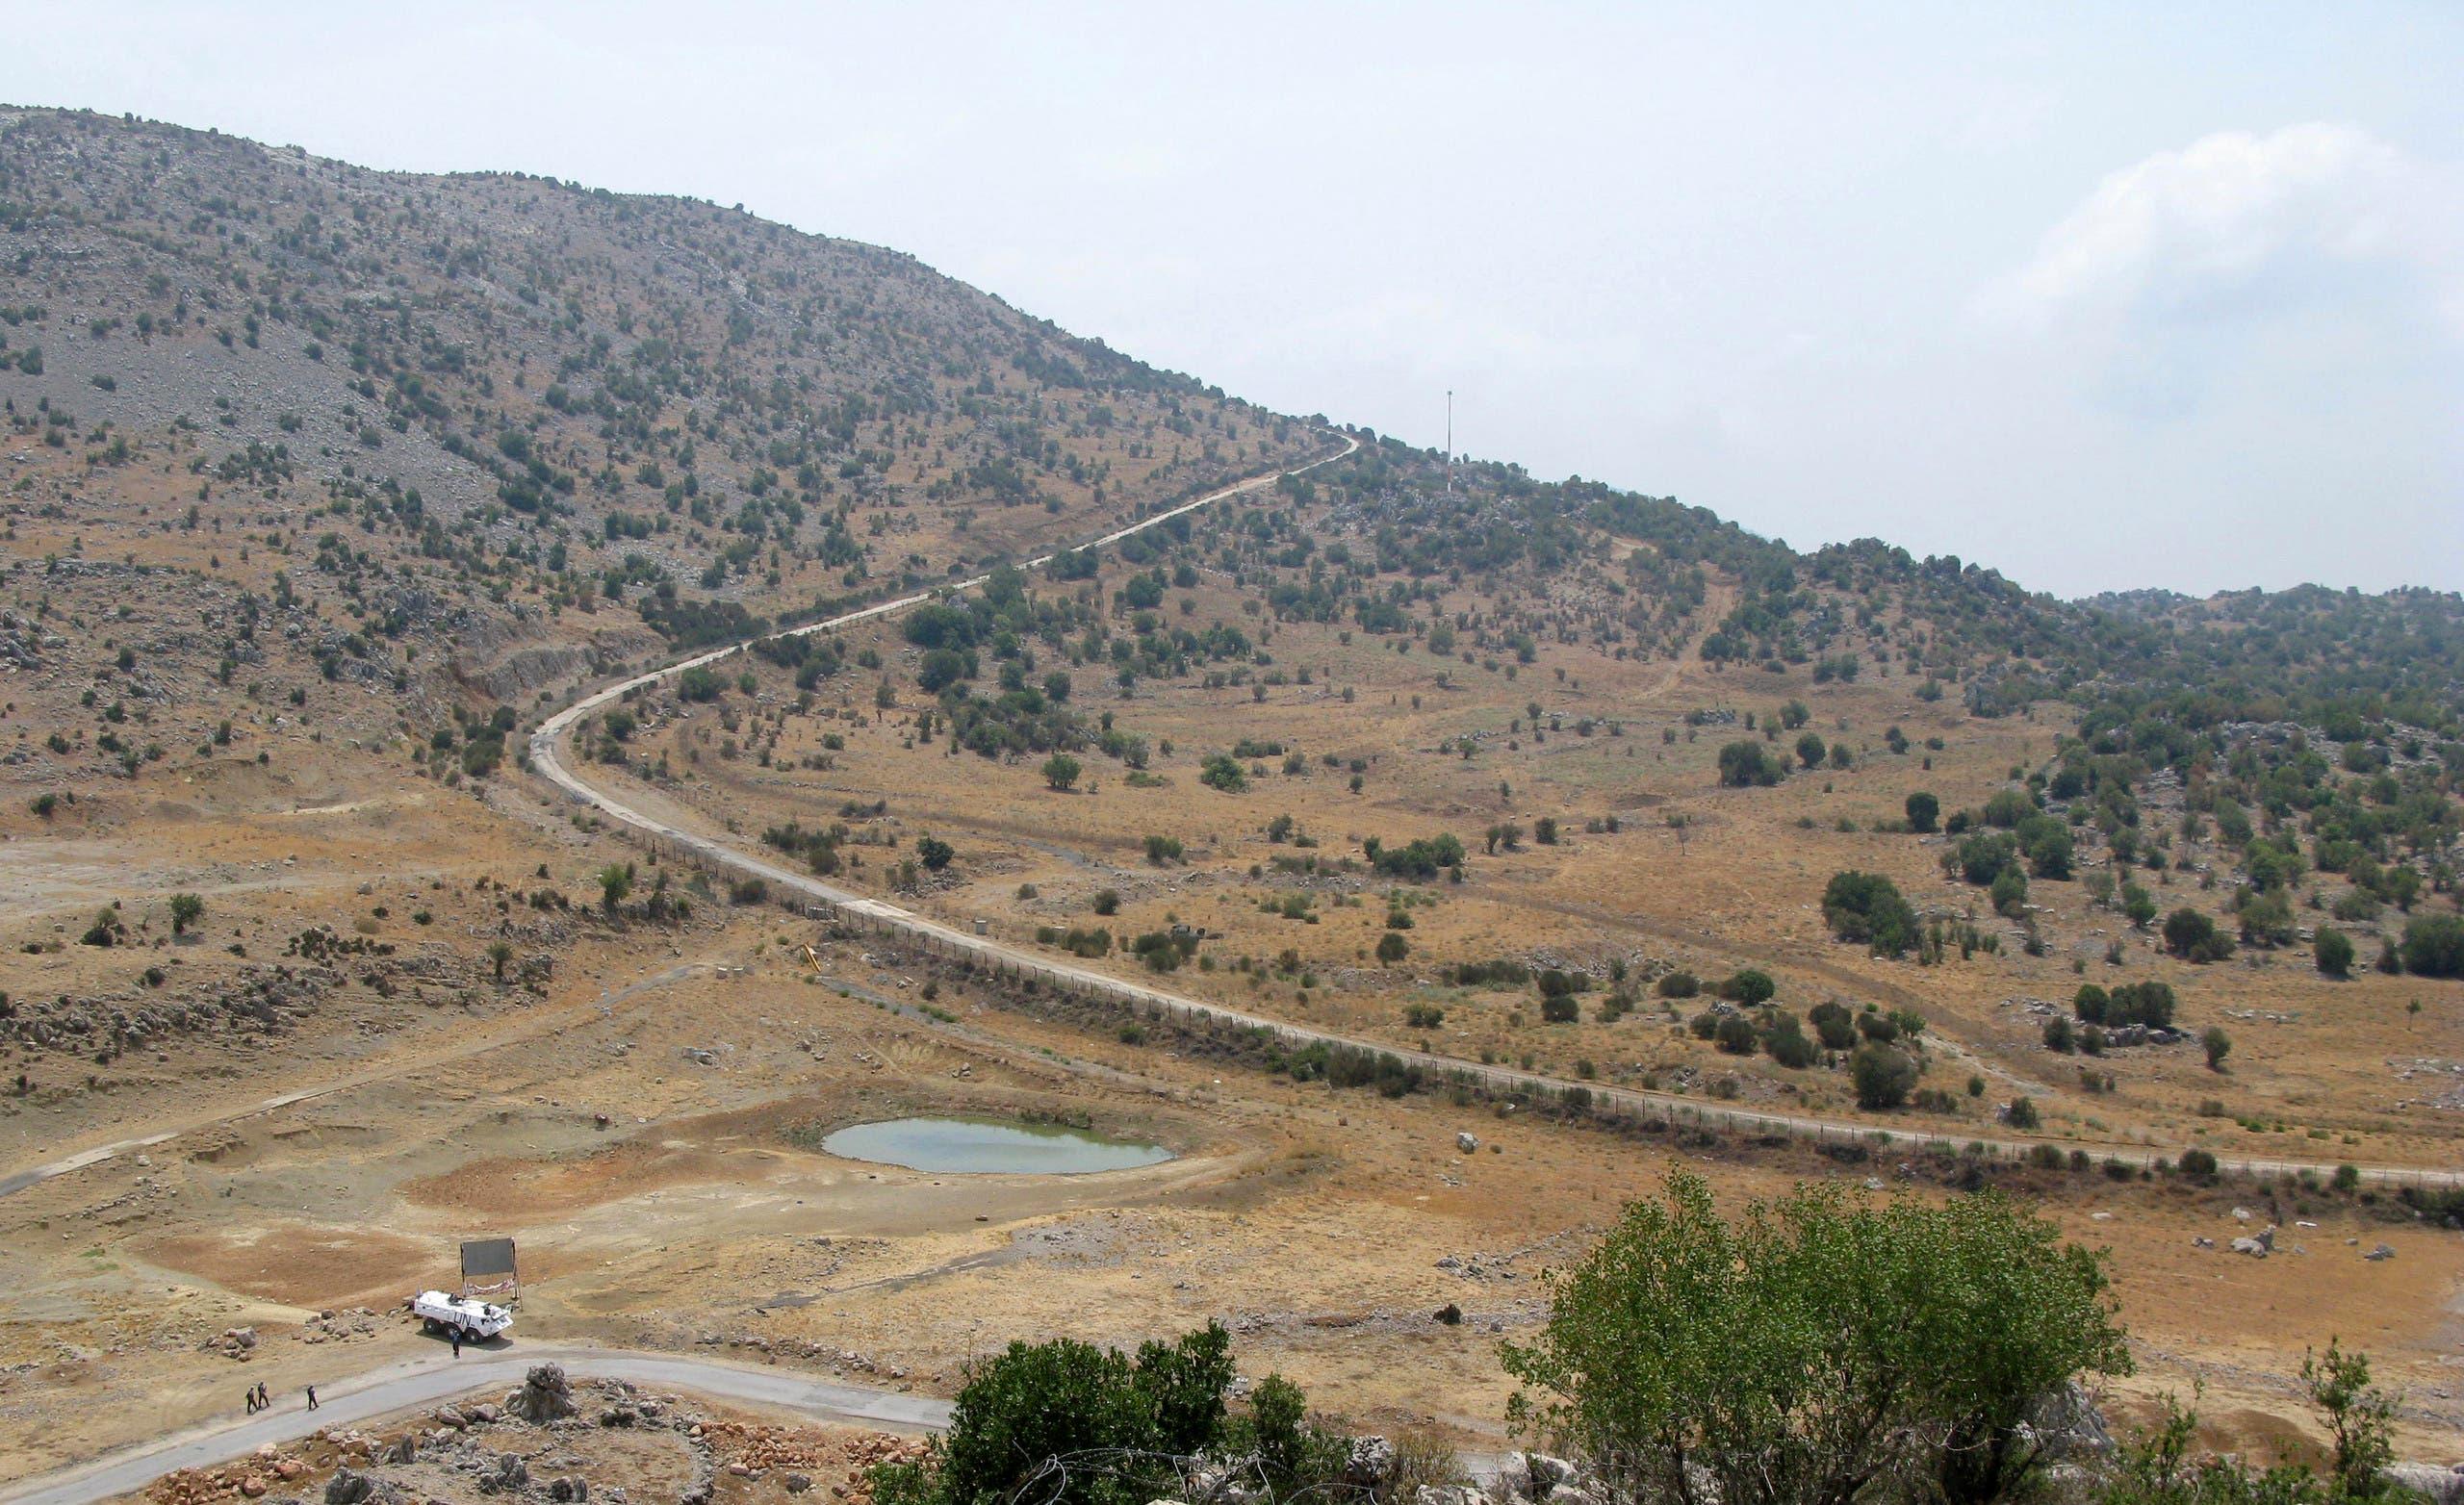 طريق مهجور في مزارع شبعا